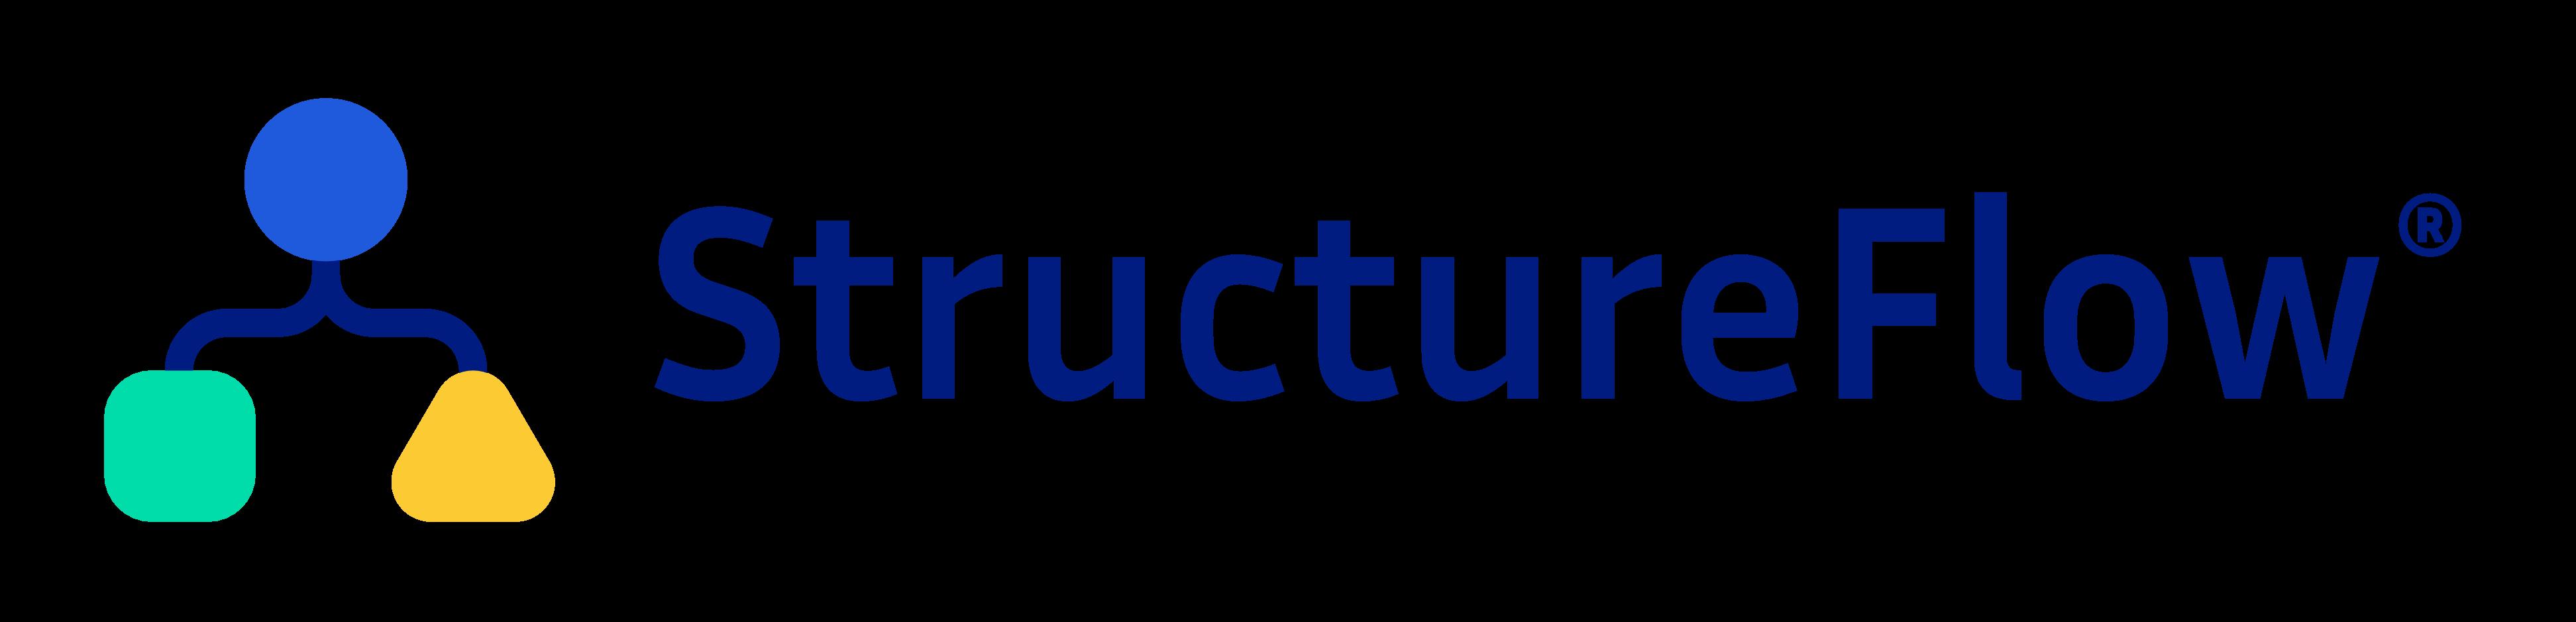 StructureFlow Ltd